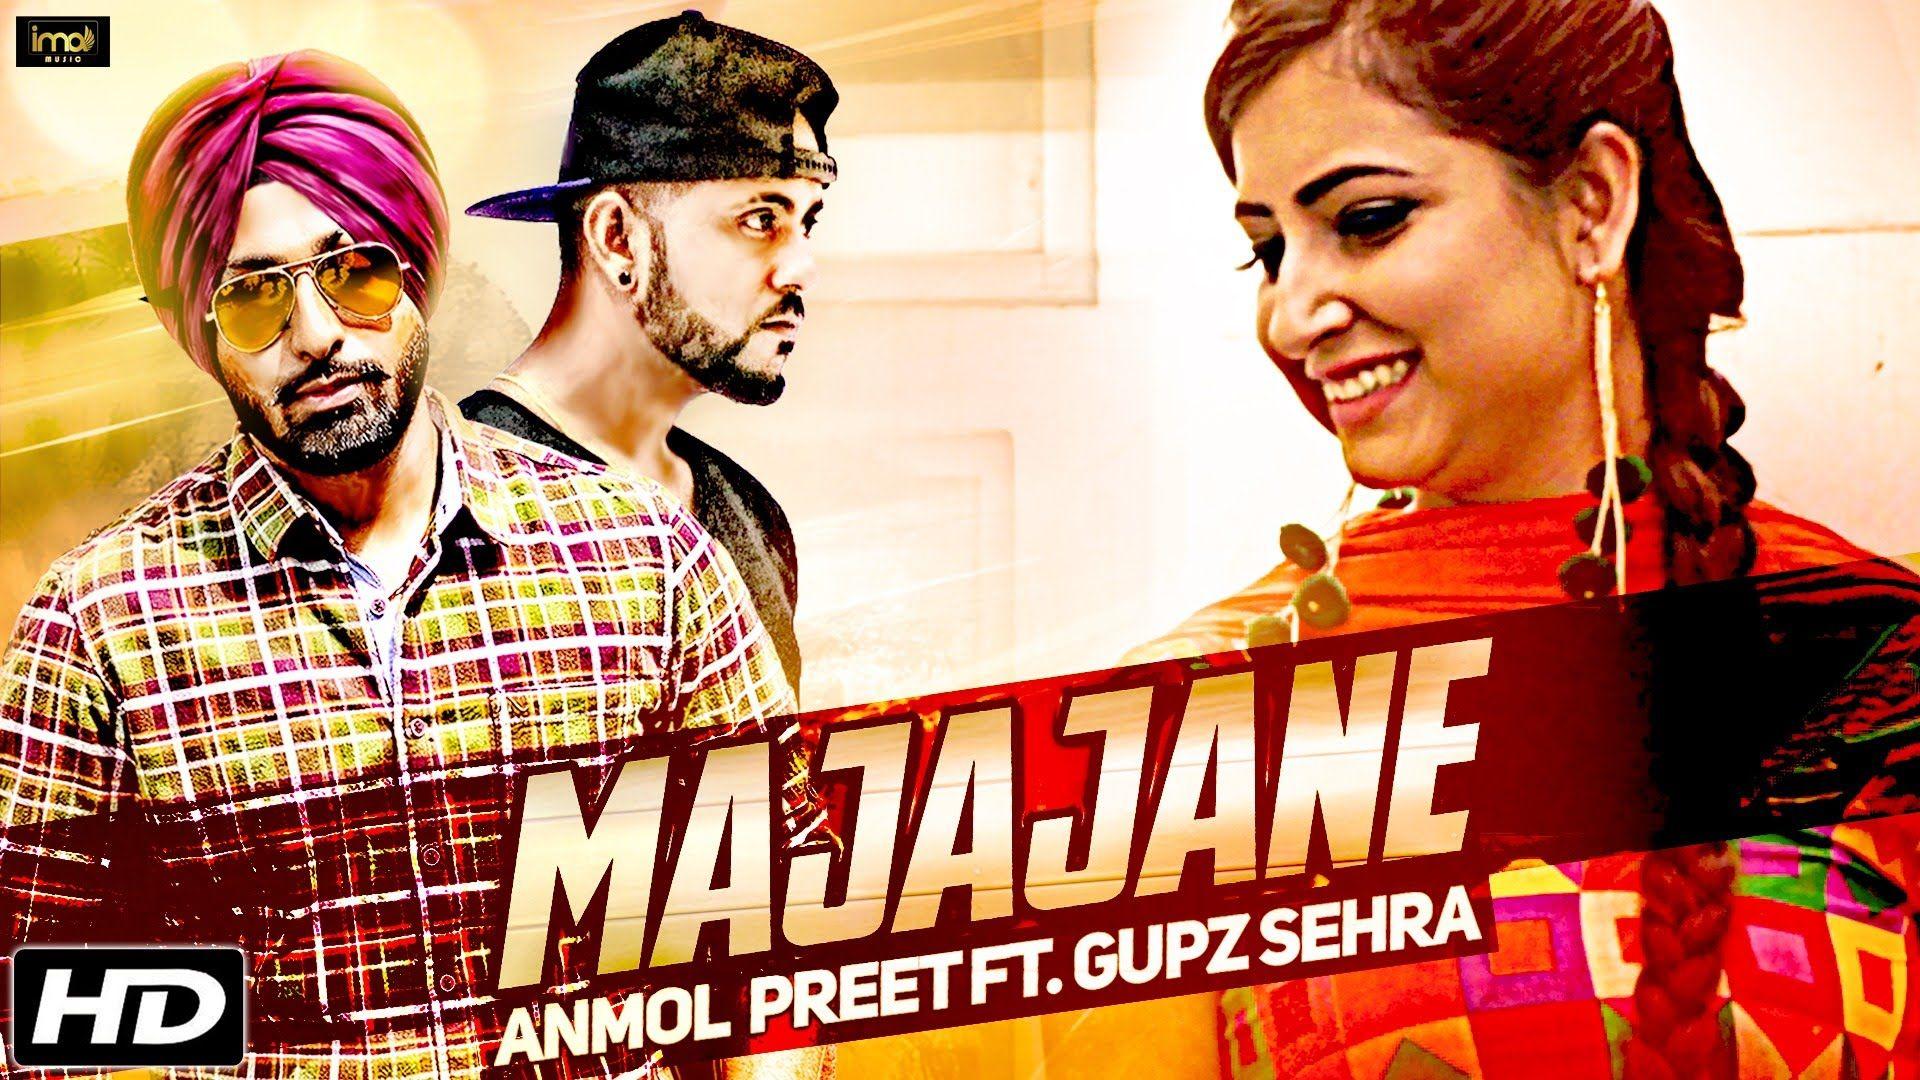 Majajane Anmol Preet Mp3 Download HD Mp4 Video Full